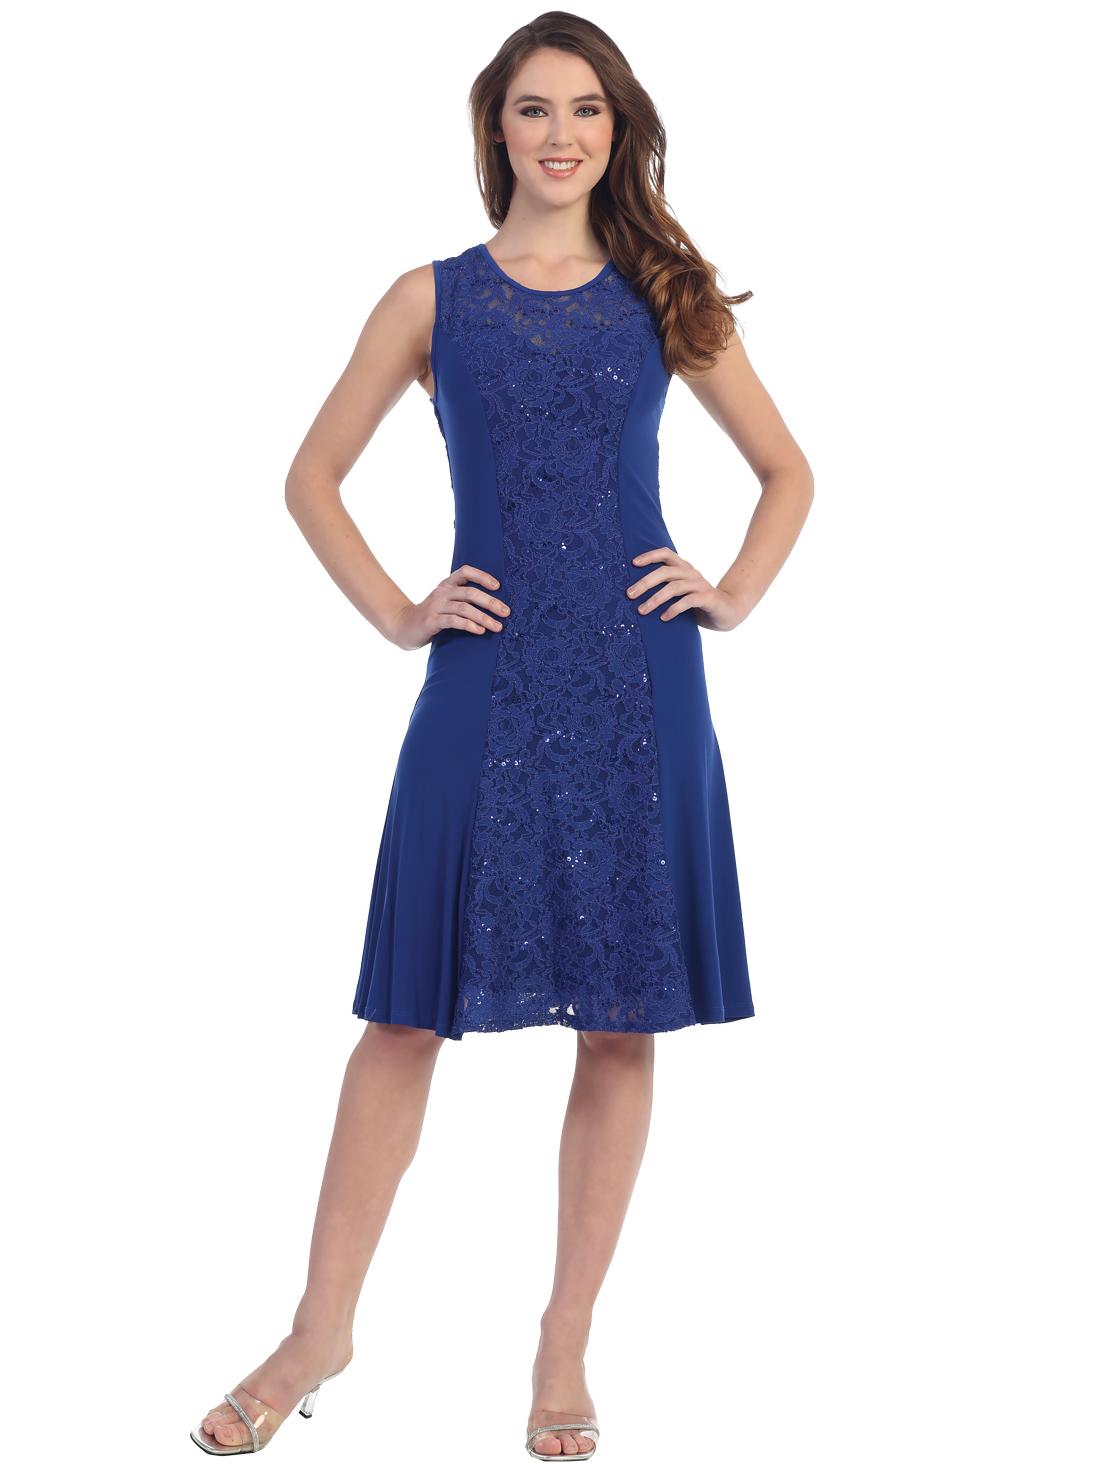 Knee length blue cocktail dresses